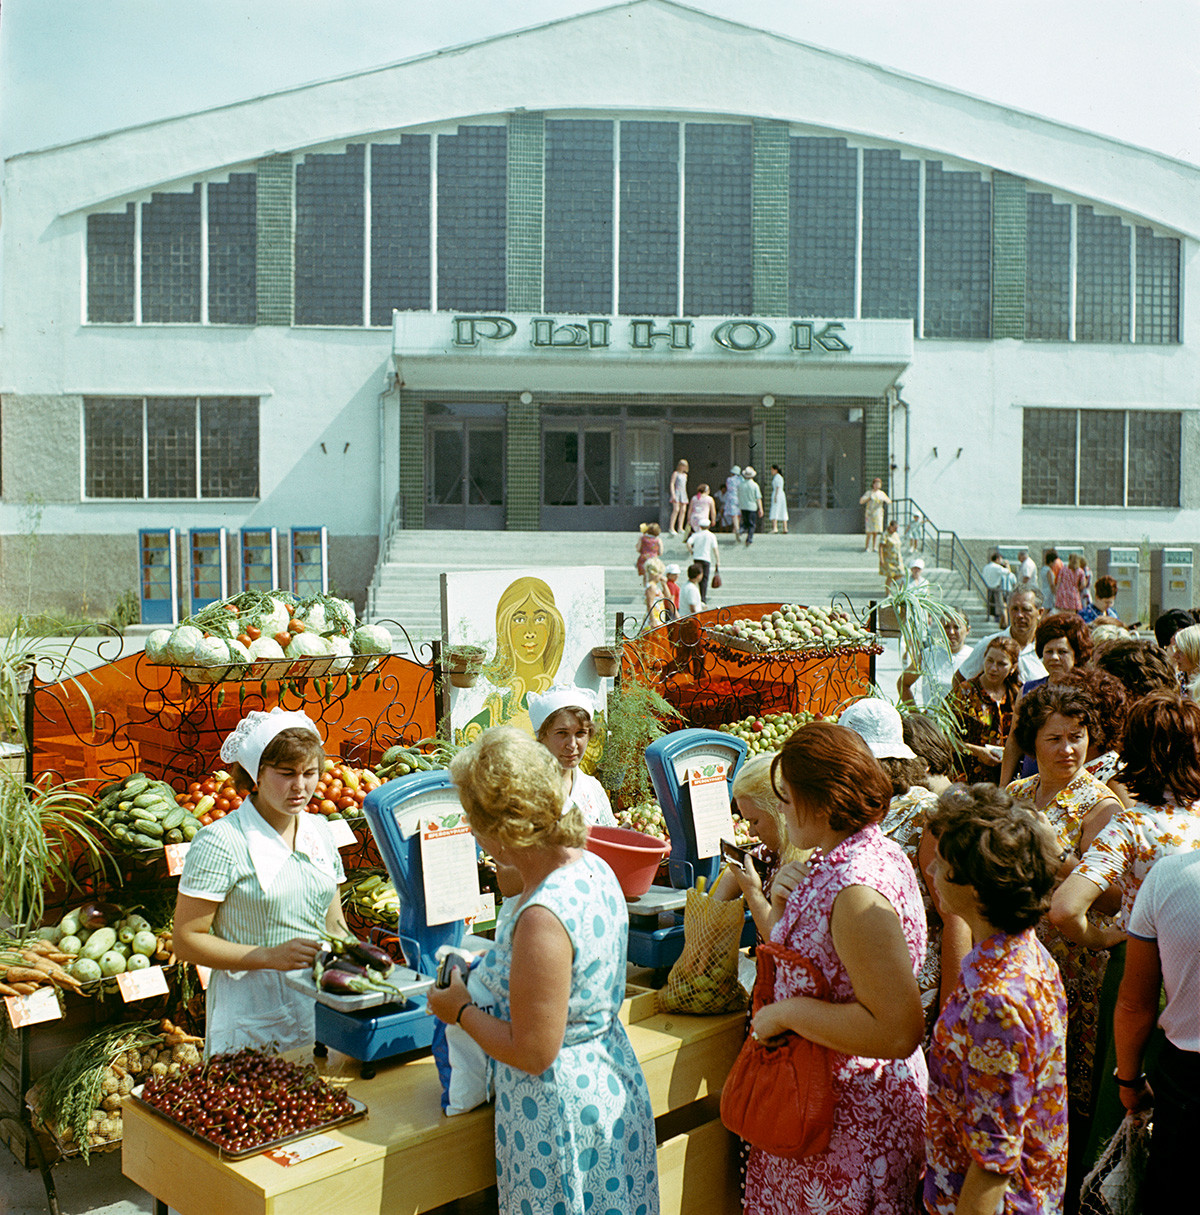 Fruit and veg sellers on a street in Yevpatoriya, Crimea, 1979